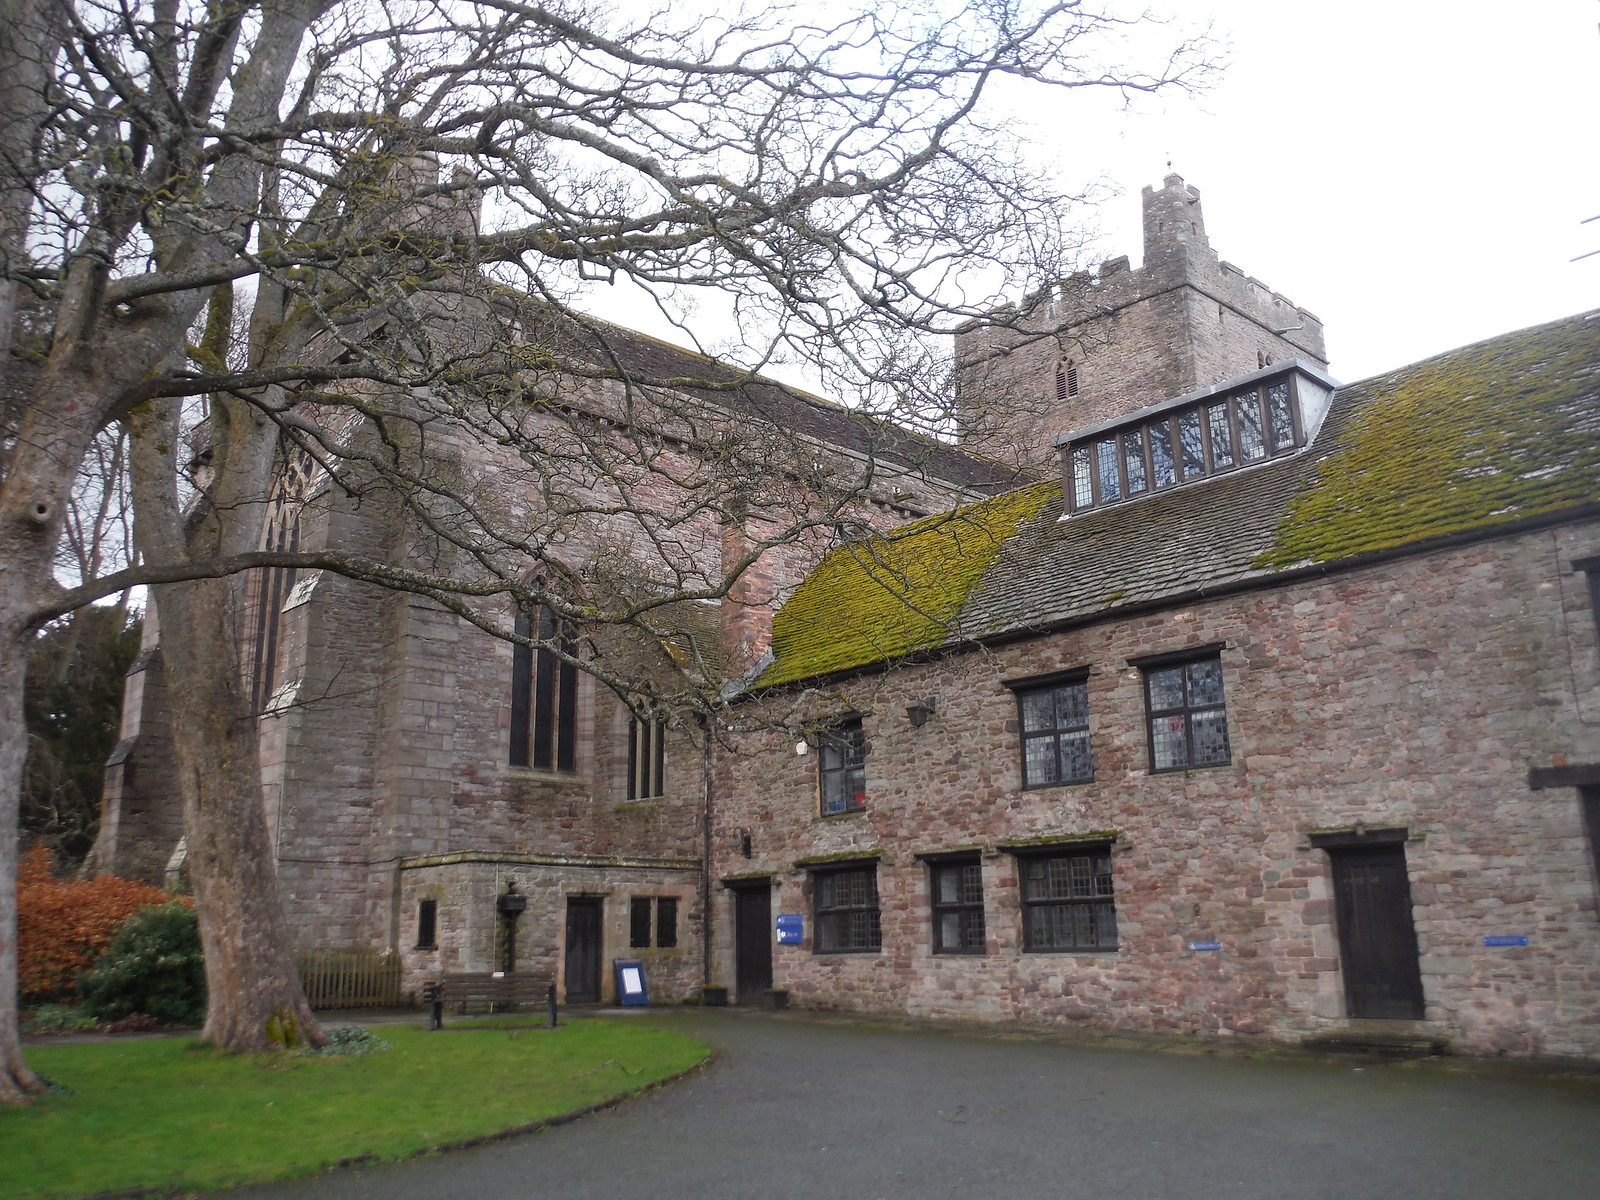 Brecon Cathedral, from Cathedral Close SWC Walk 306 - Brecon Circular (via Y Gaer, Battle and Pen-y-crug)